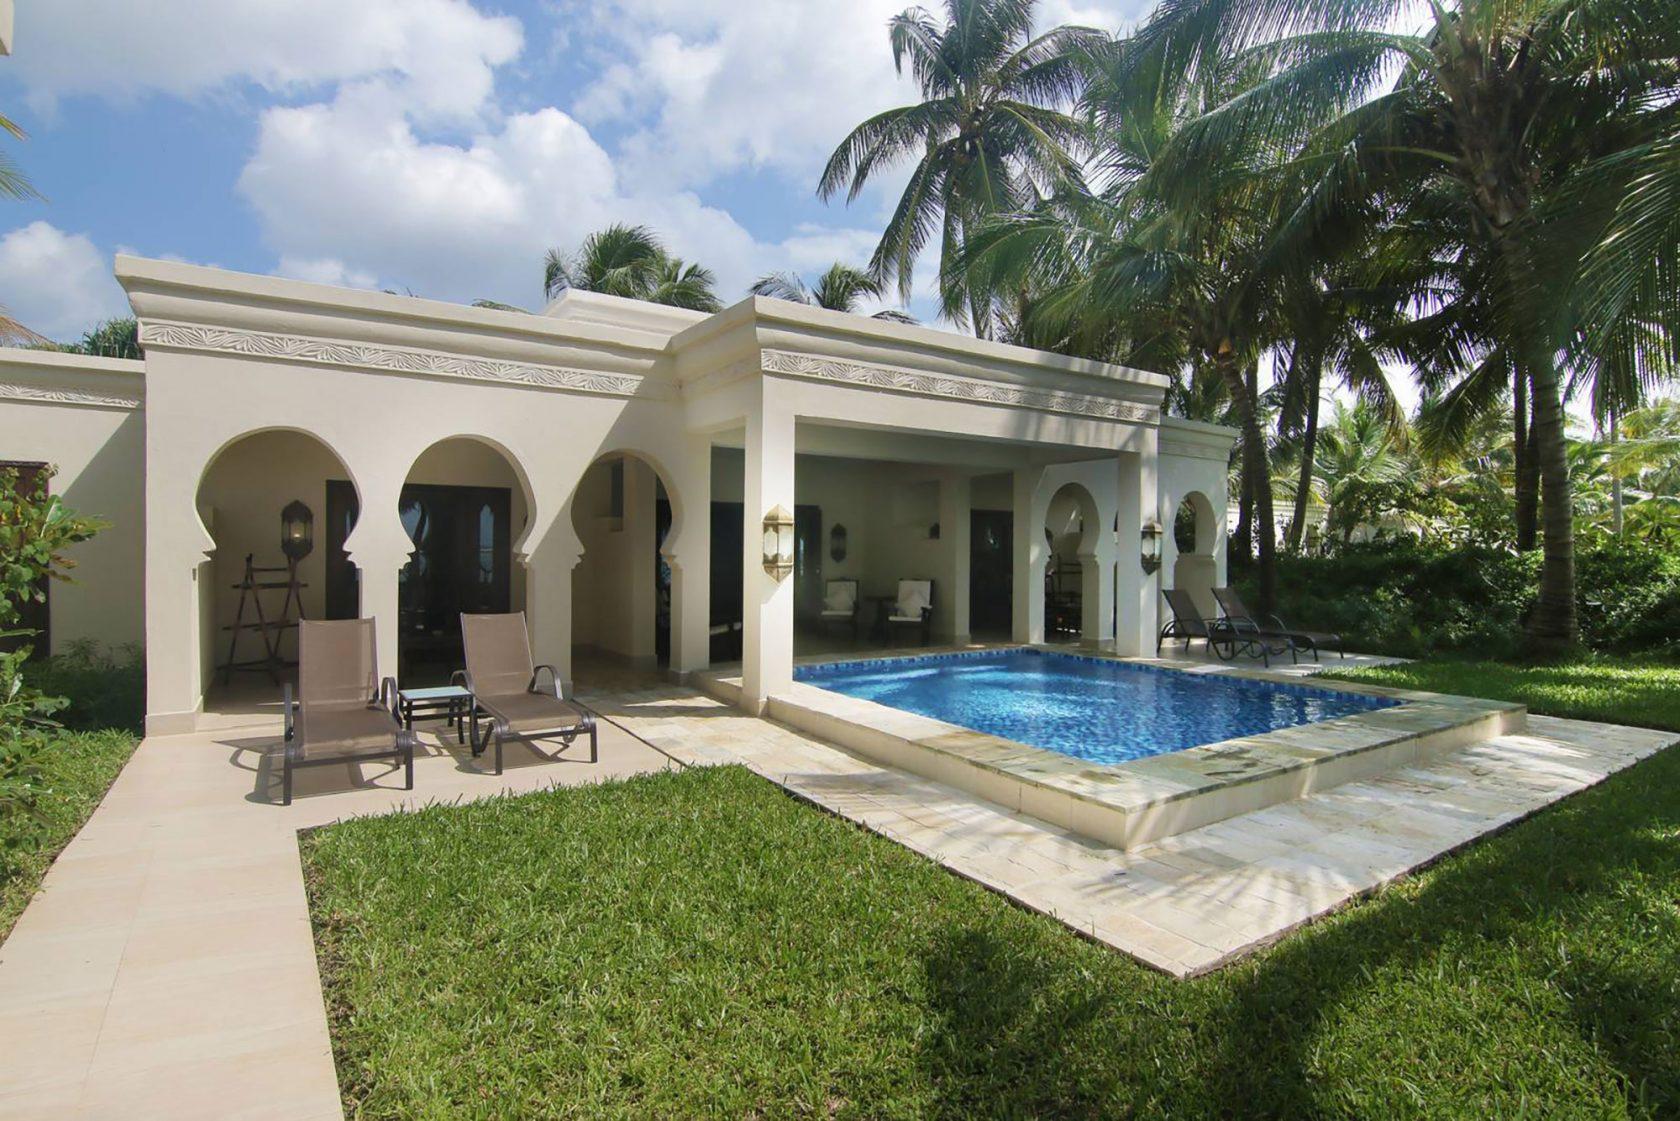 Baraza Resort & Spa Presidential Villa